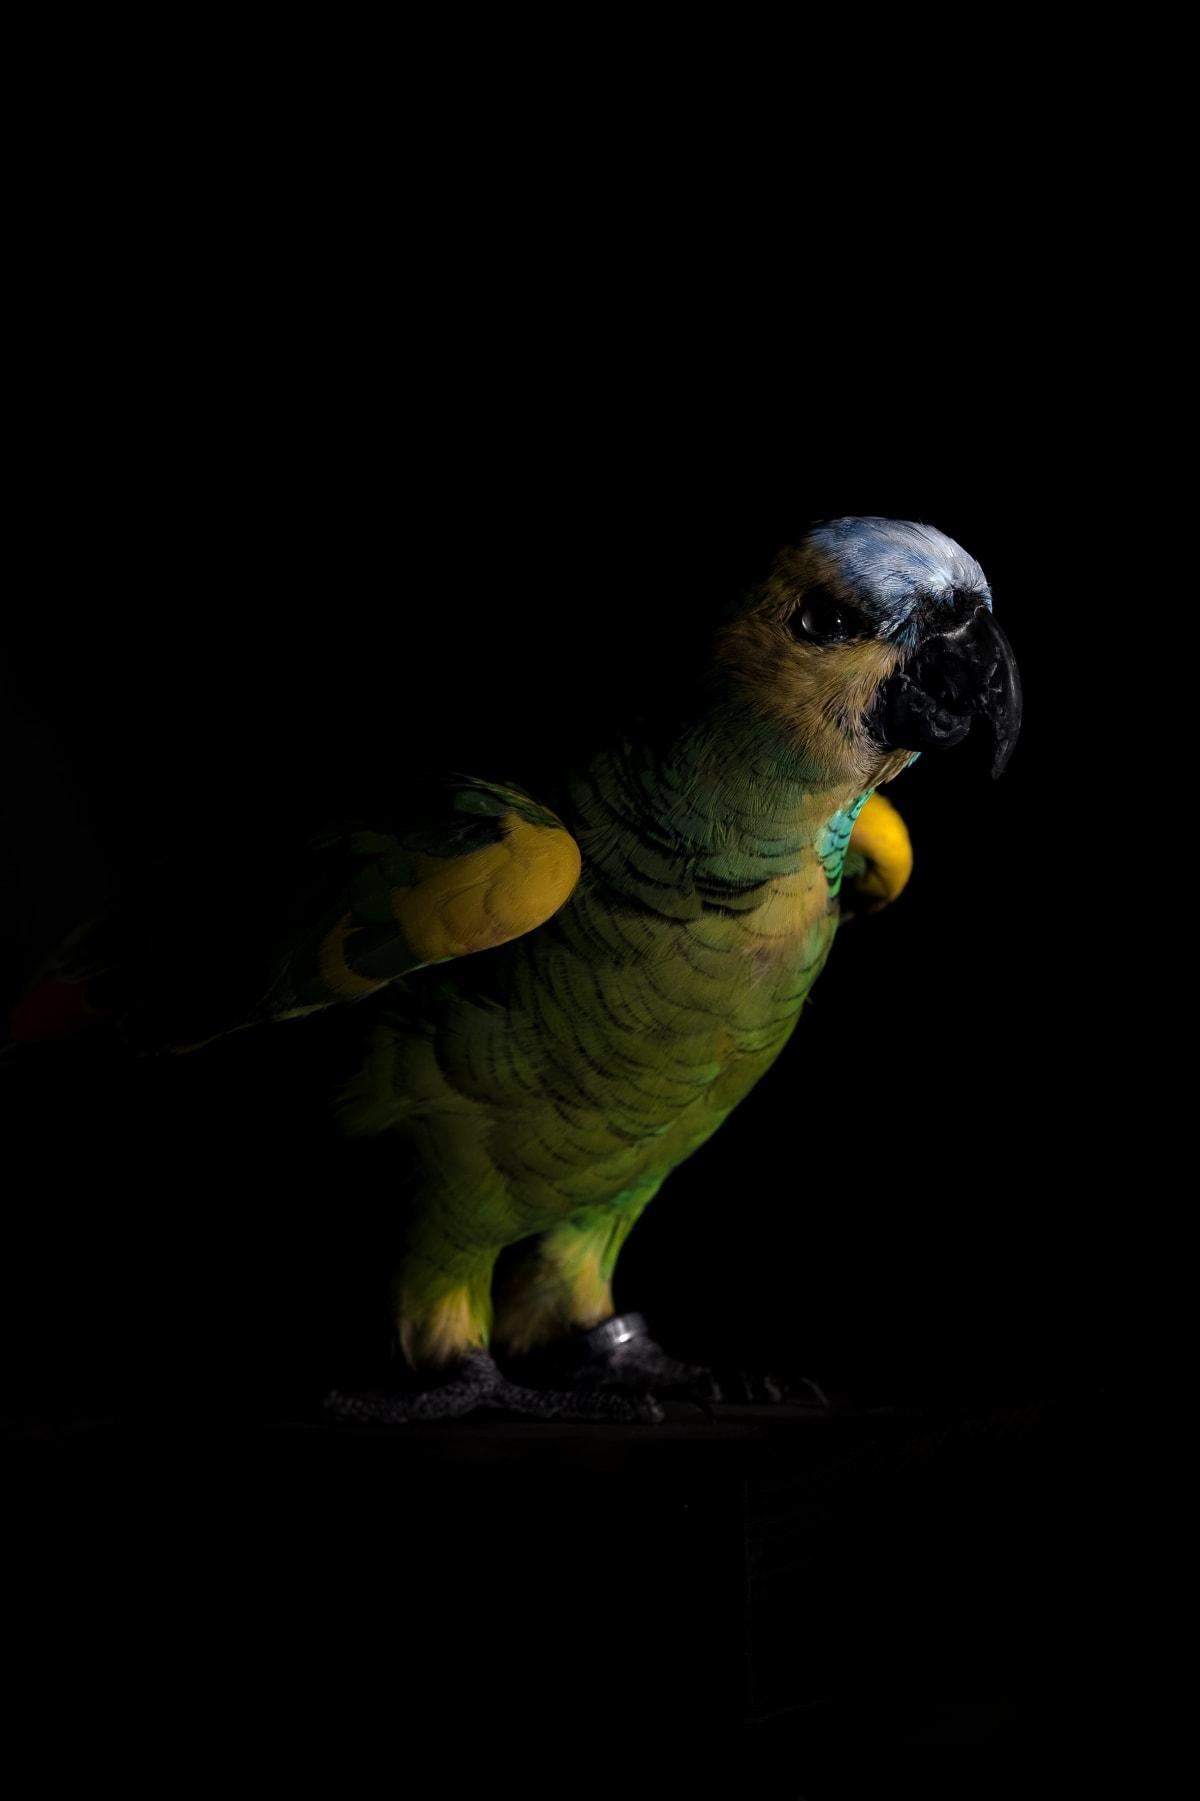 Lucas Lenci, Oiseau 66, 2015 - 2019